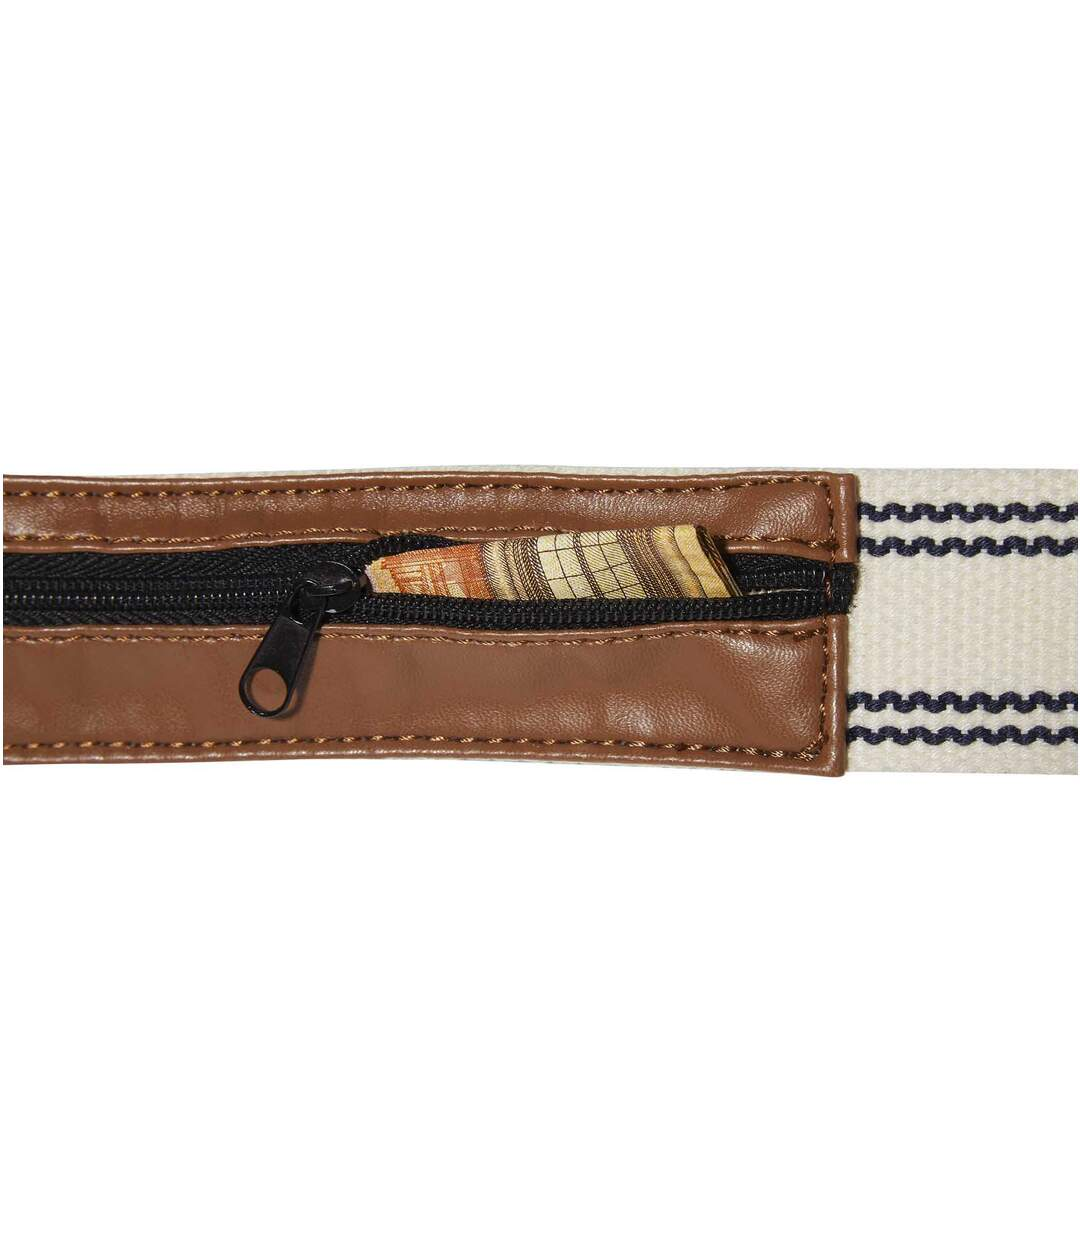 Men's Canvas Belt with Money Pocket